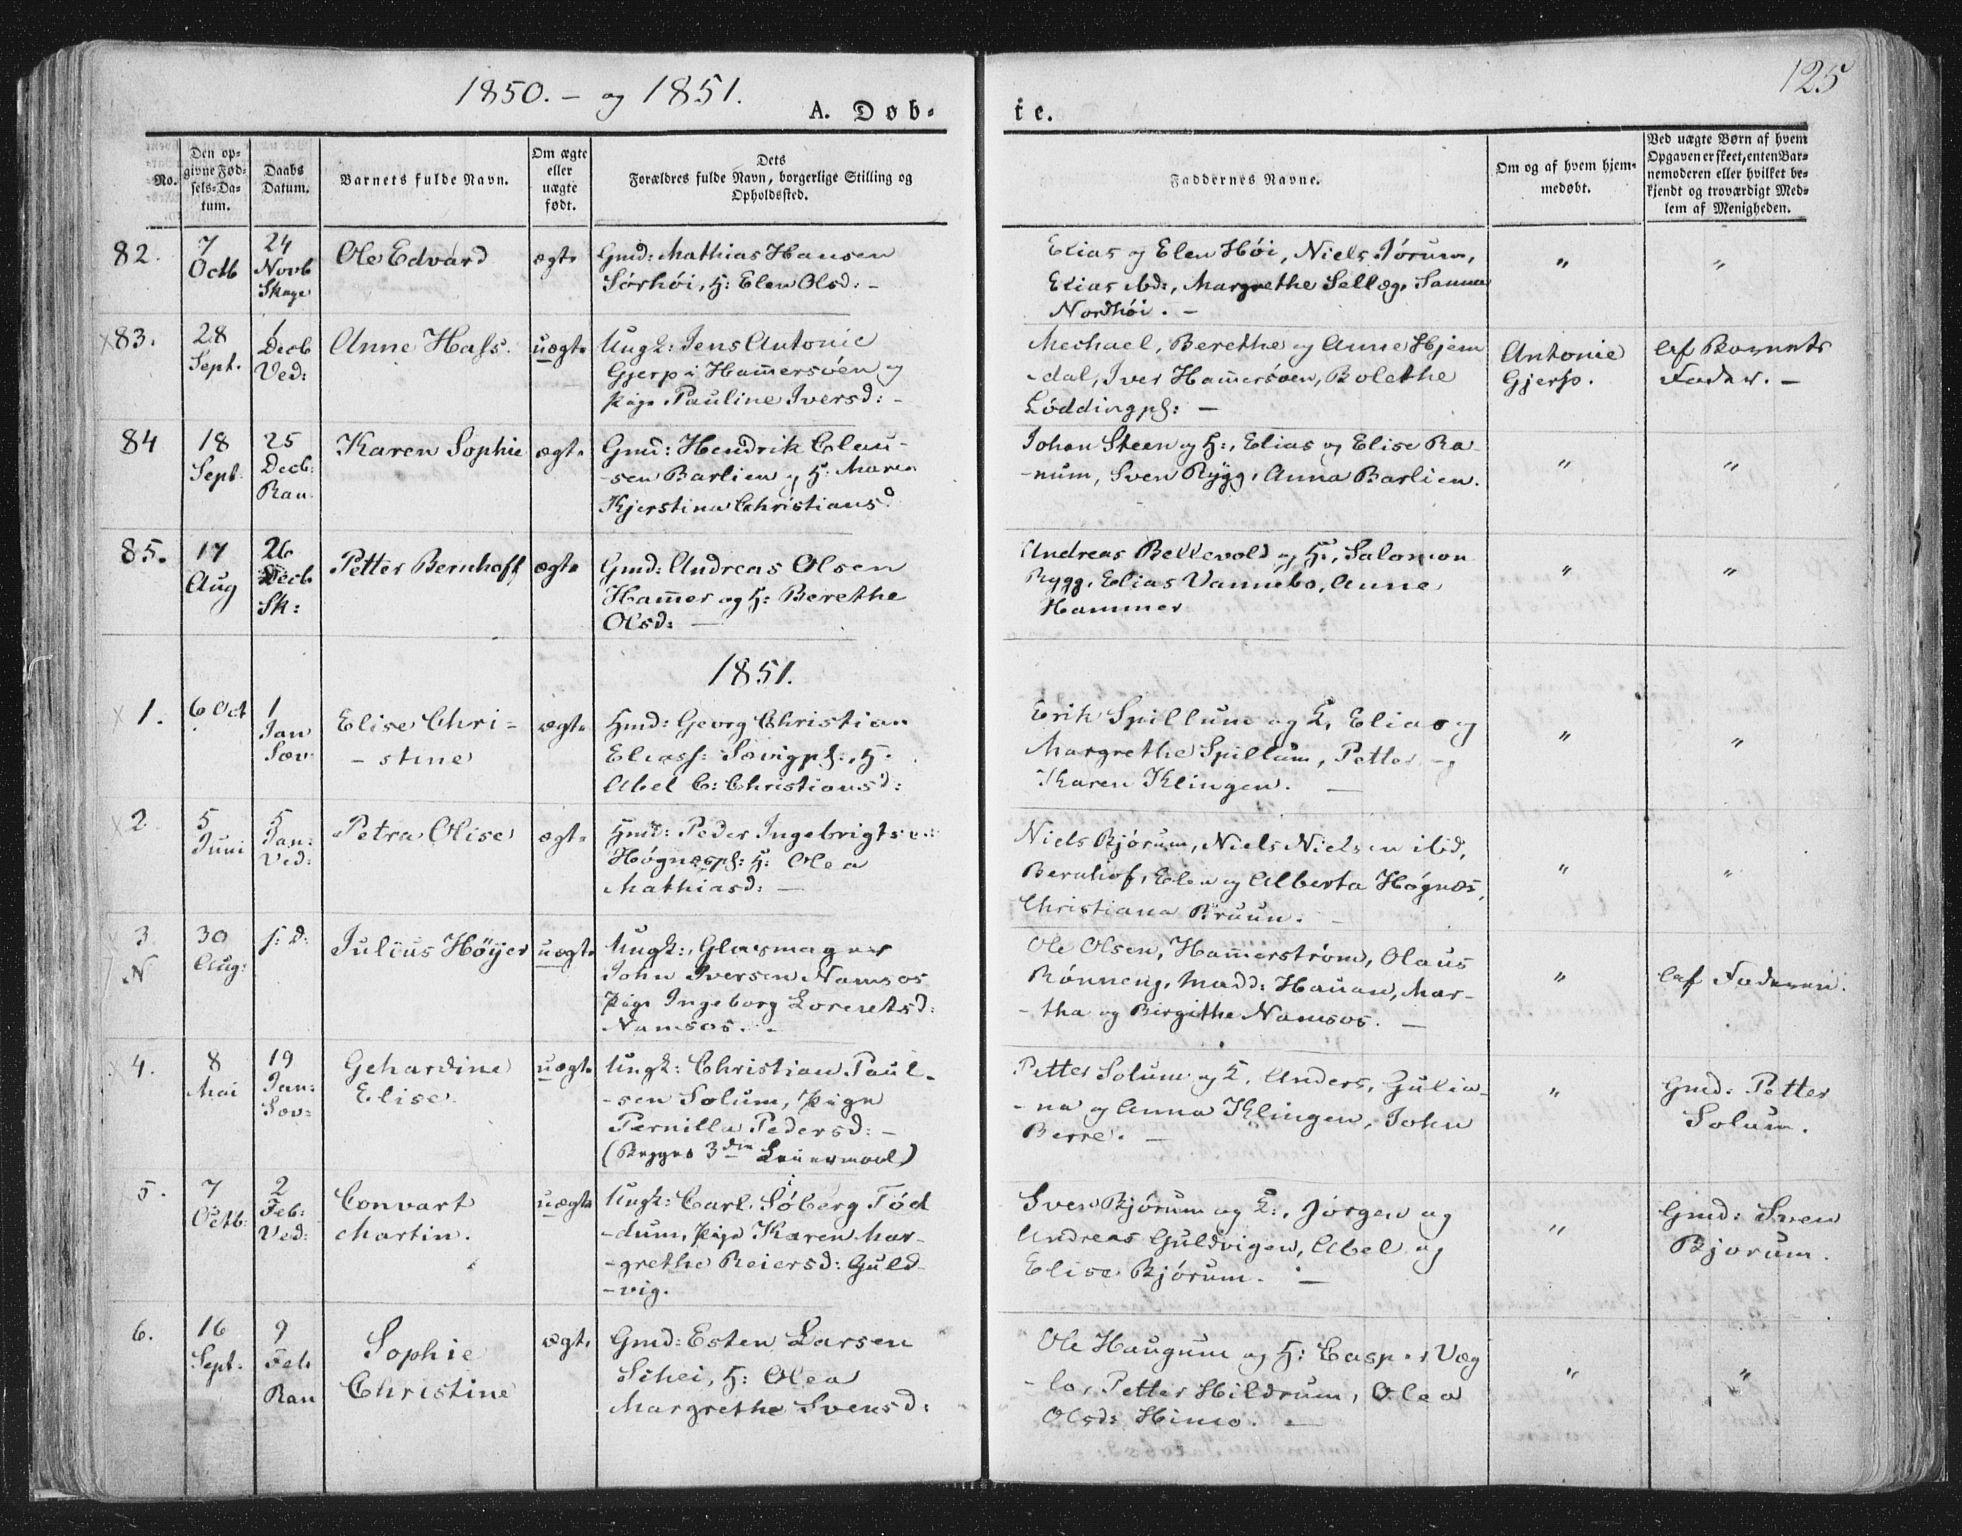 SAT, Ministerialprotokoller, klokkerbøker og fødselsregistre - Nord-Trøndelag, 764/L0551: Ministerialbok nr. 764A07a, 1824-1864, s. 125